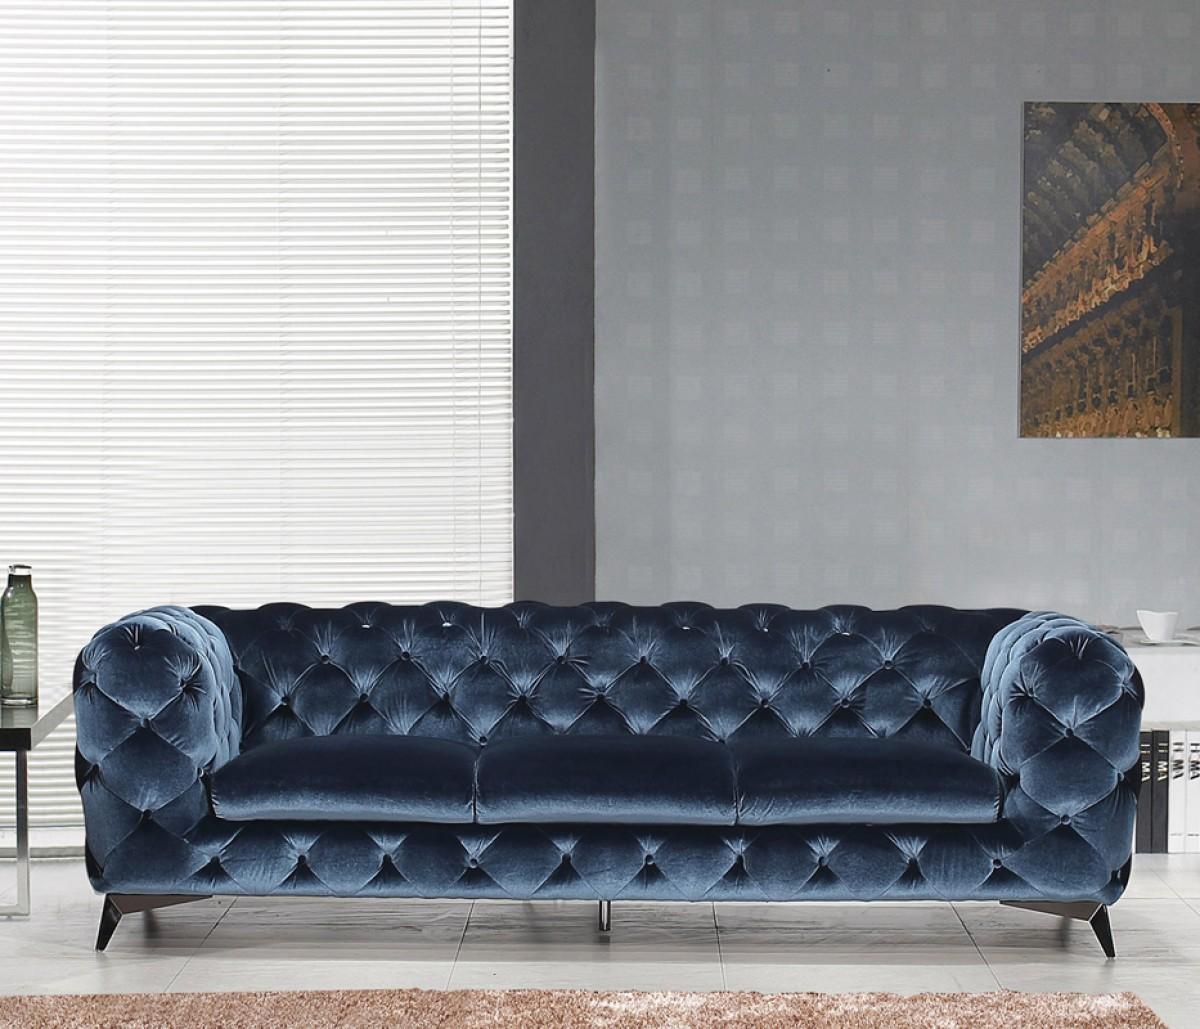 carlone-sofa-in-blue.jpg